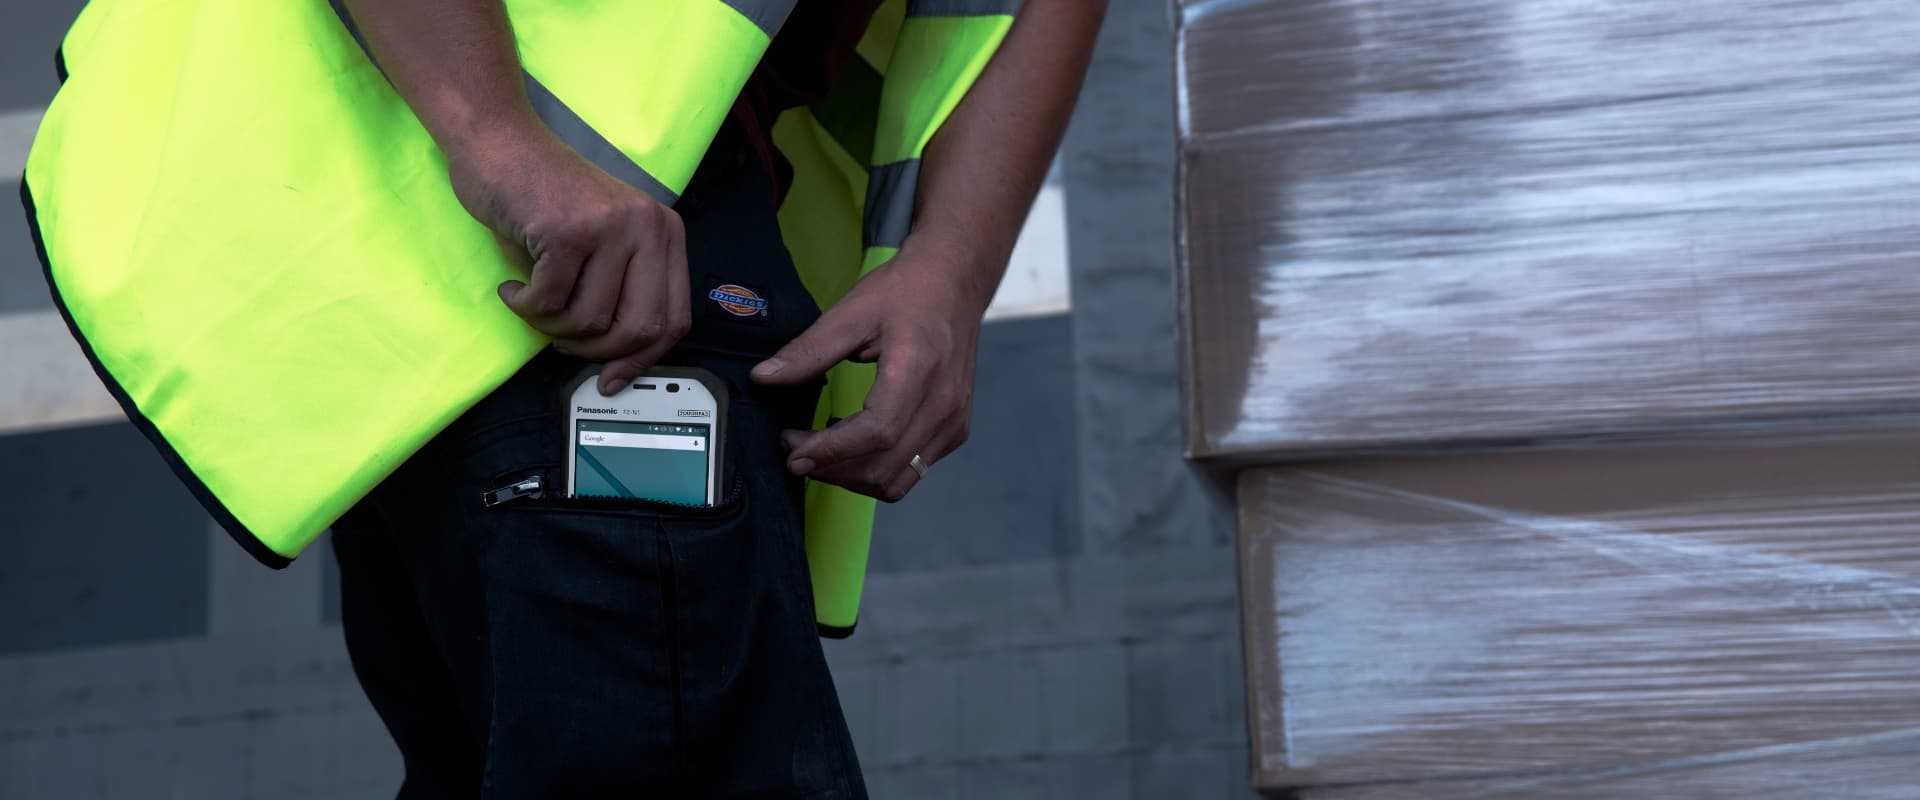 Smartphone Scanning im Transport